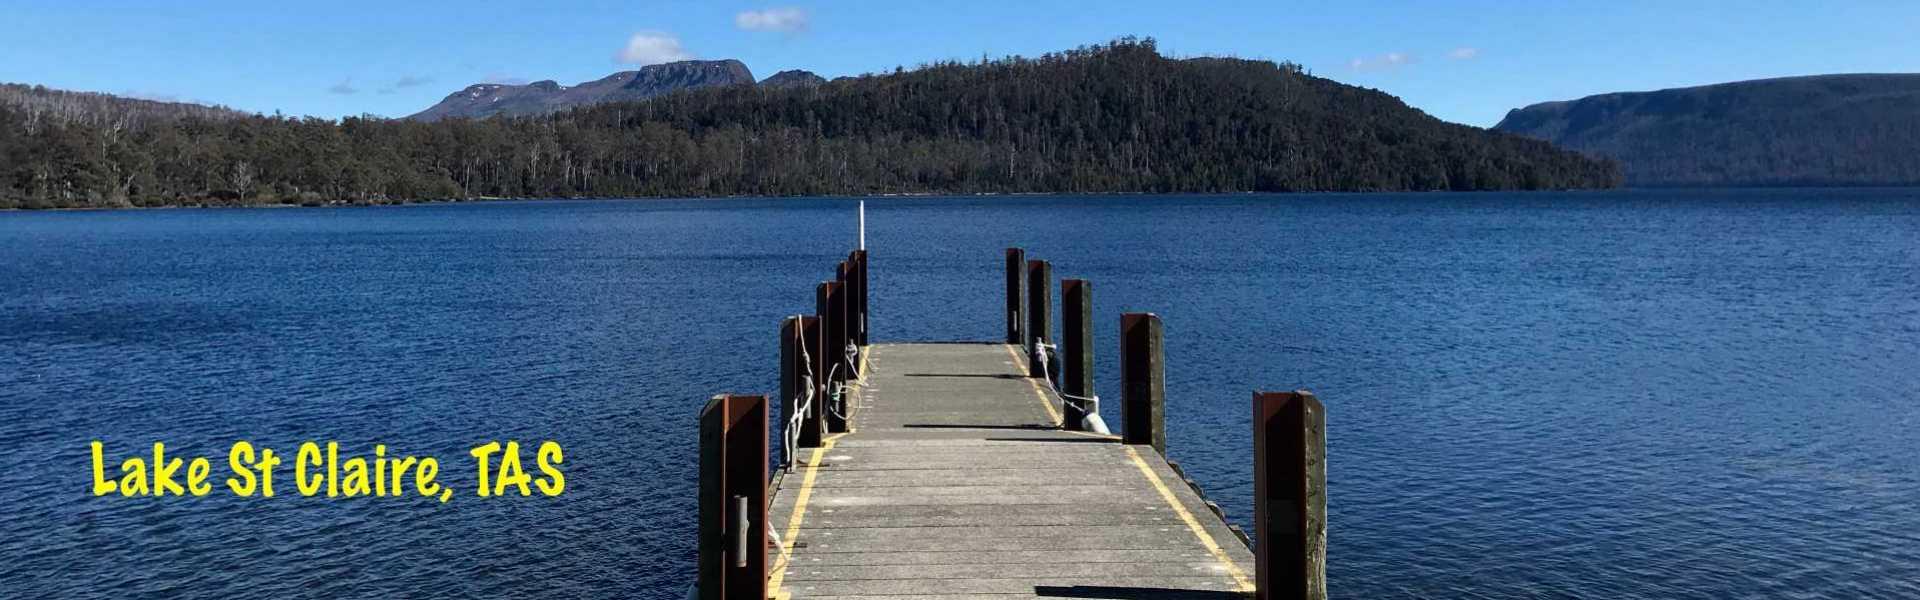 Lake St Claire, Tasmania